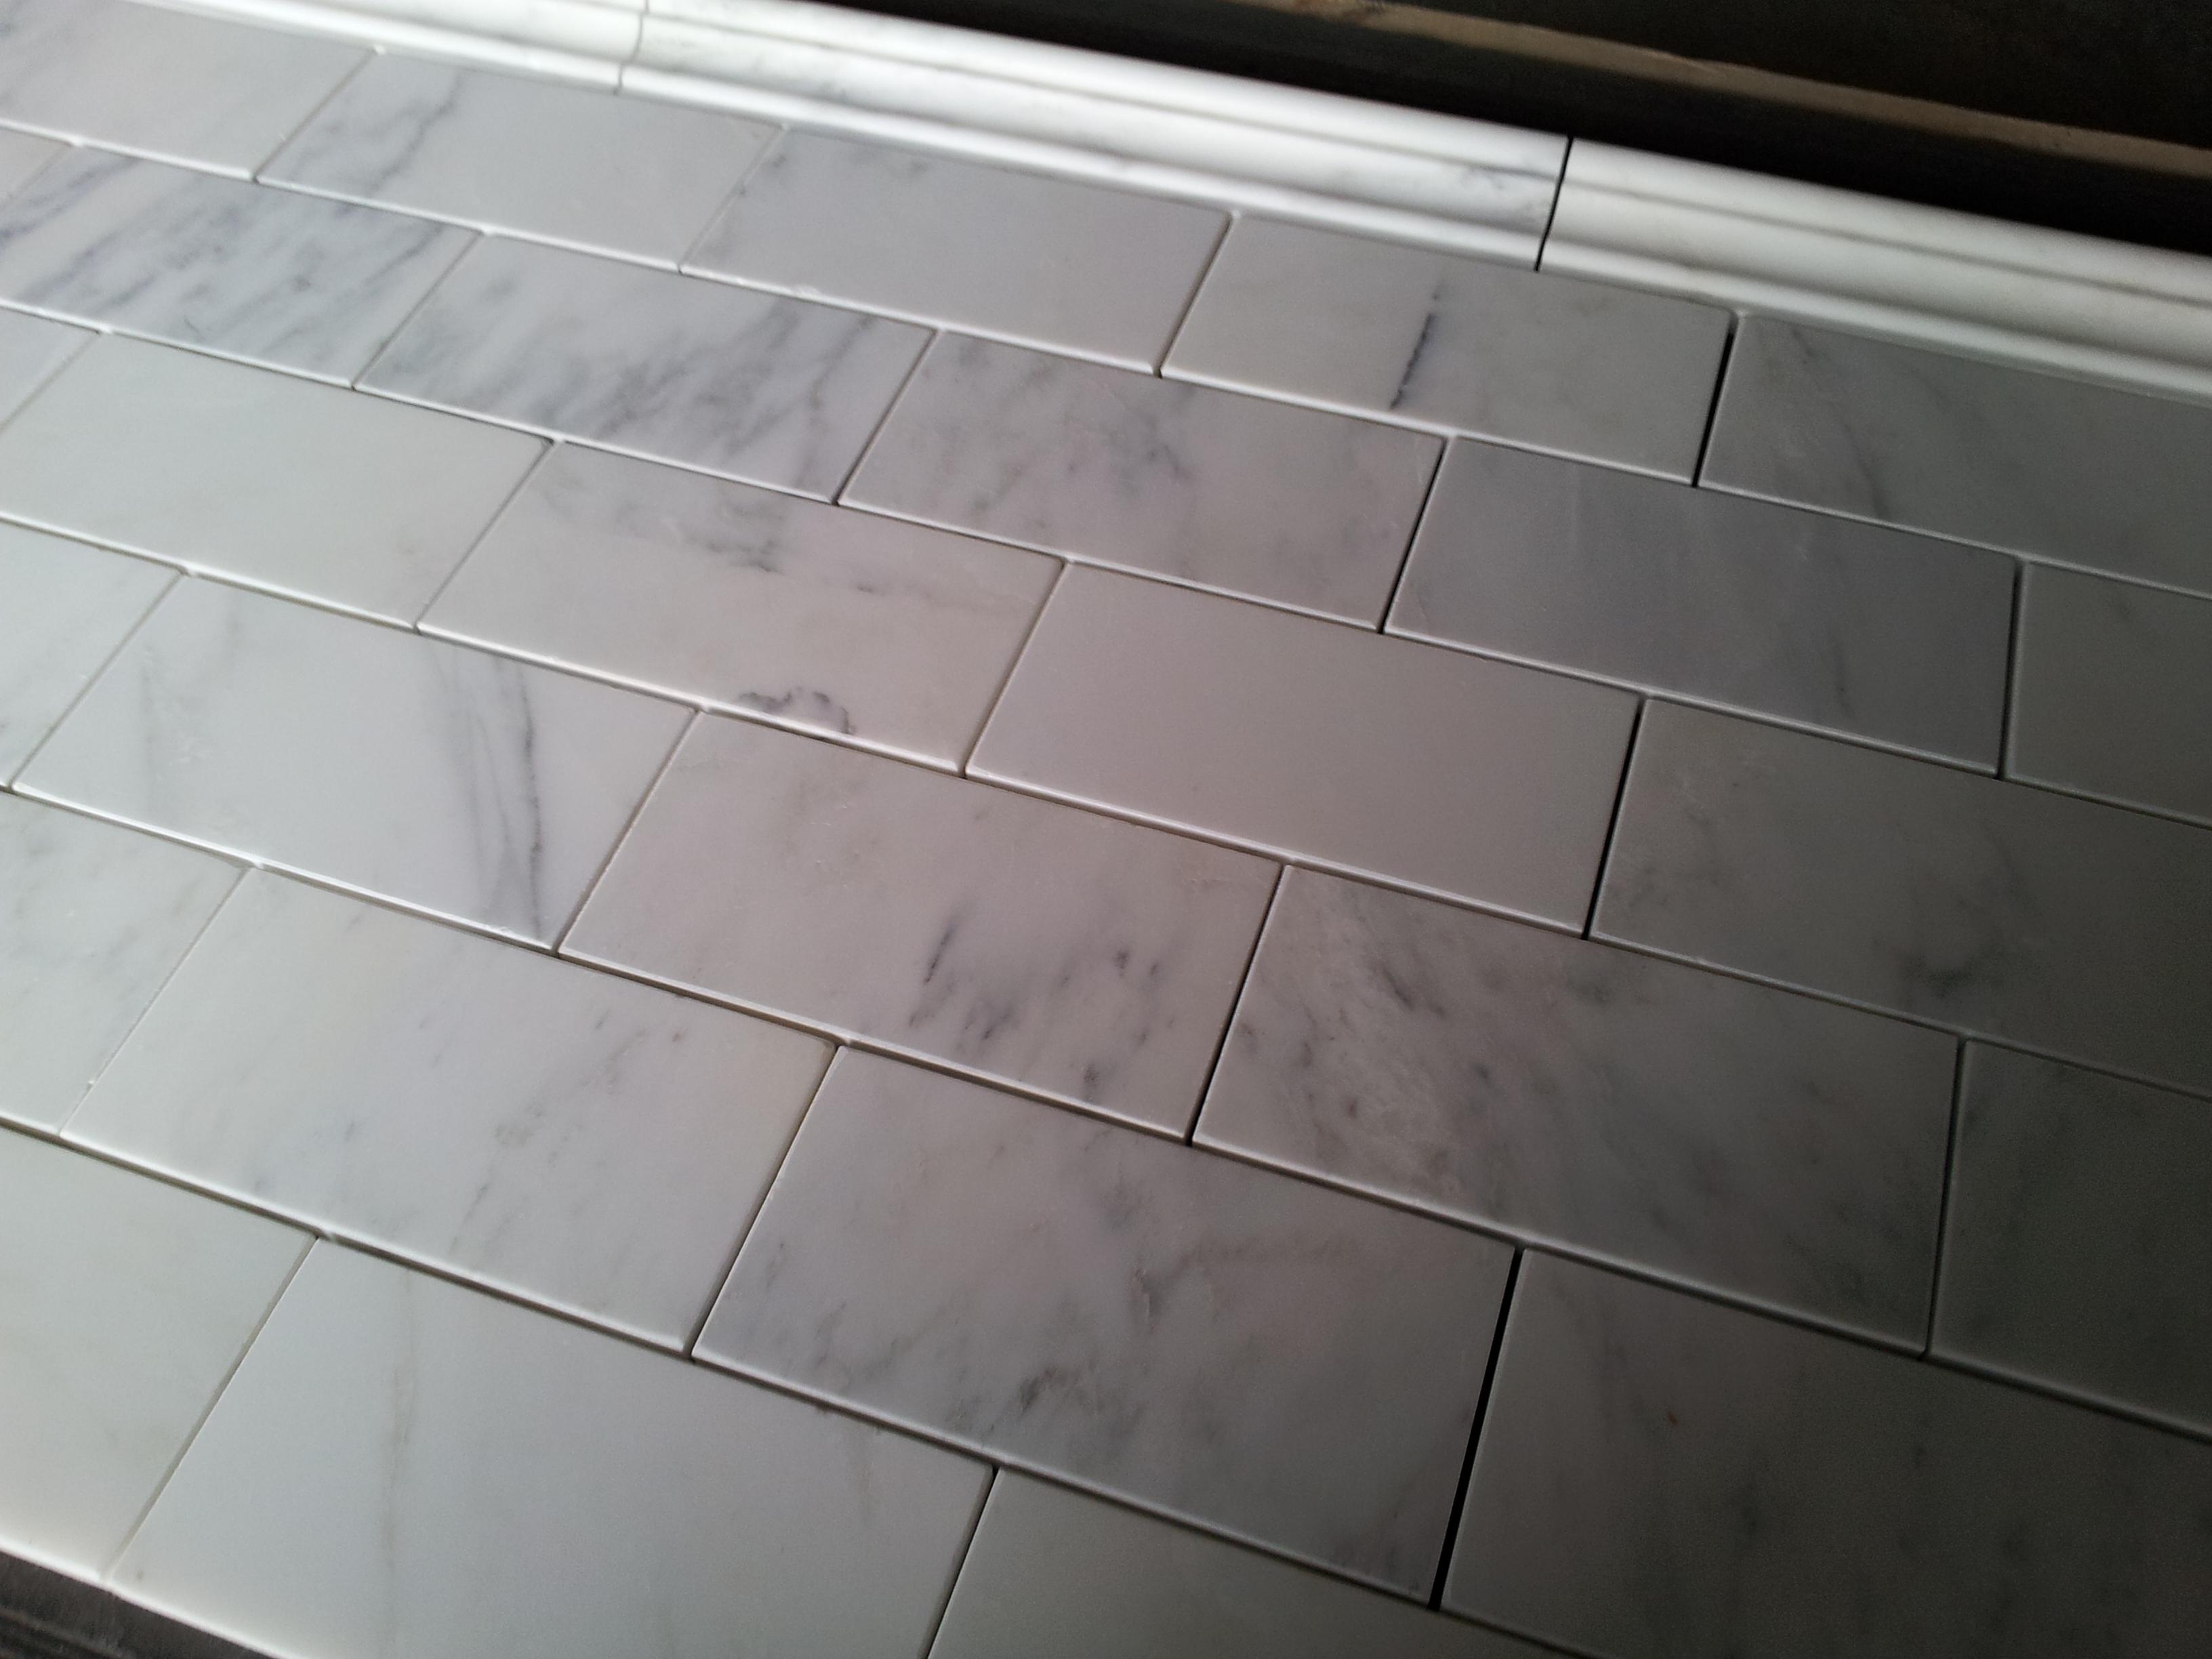 lowes chair rail tile outdoor covers walmart carrara marble subway home decor